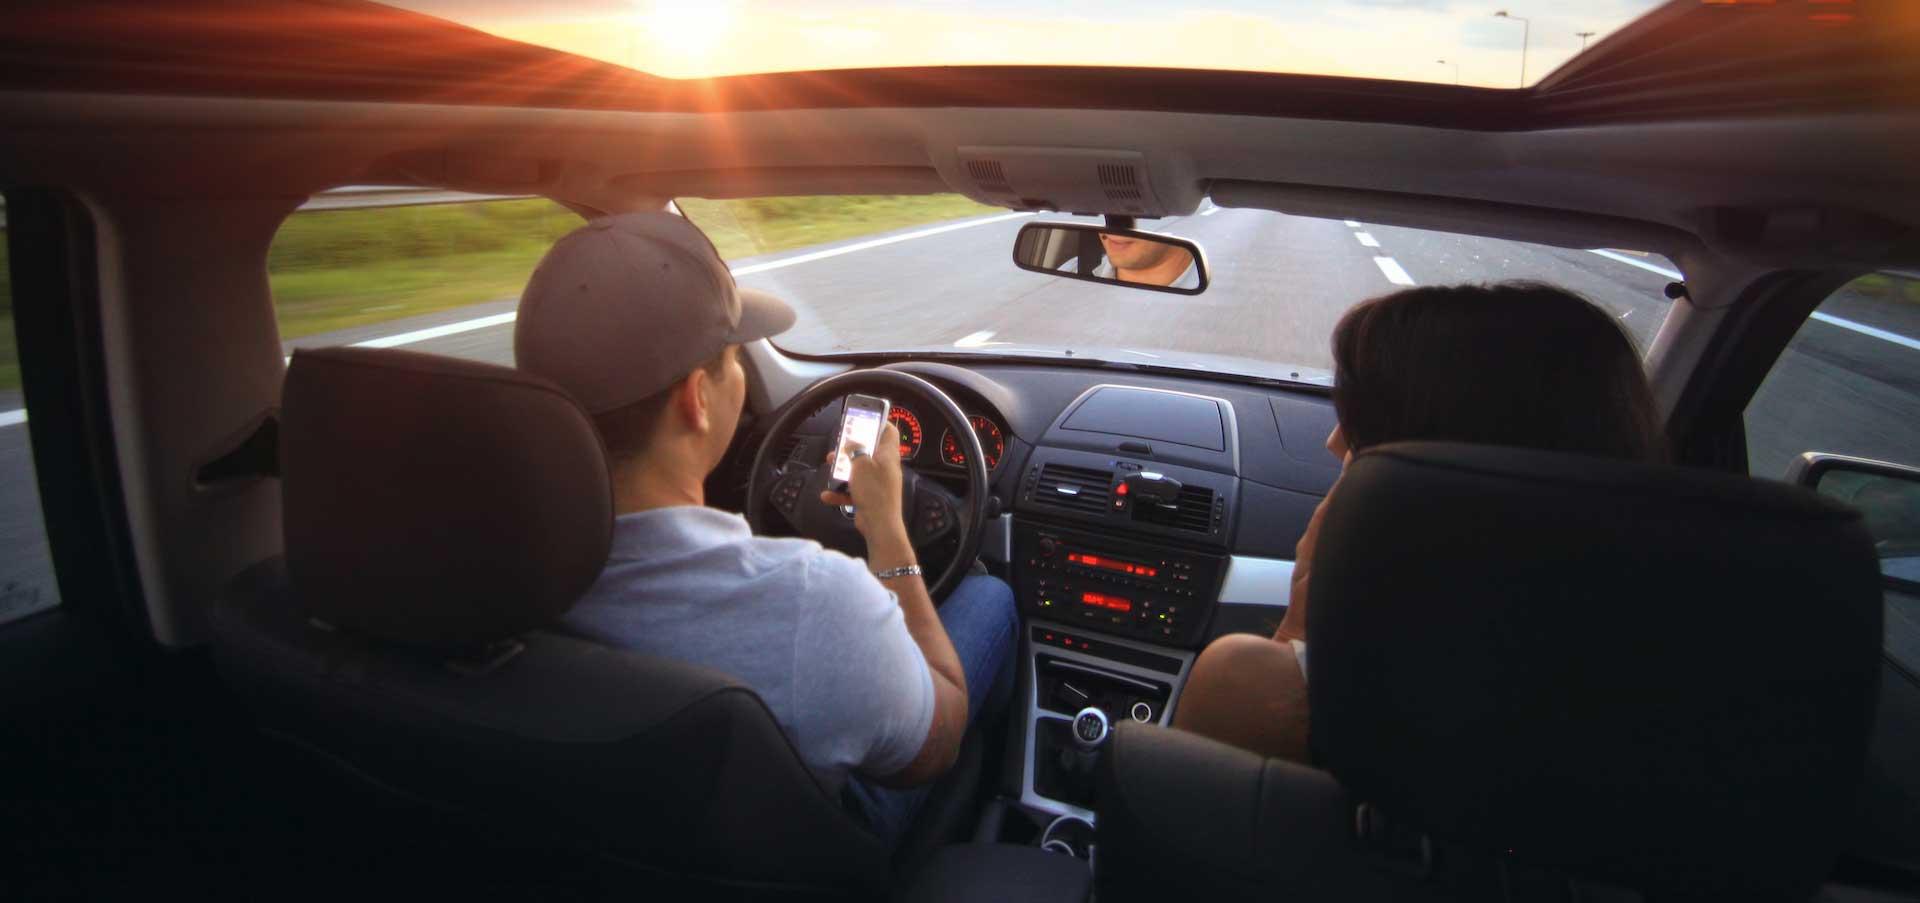 Digital Advertising Case Study - Auto Car Insurance